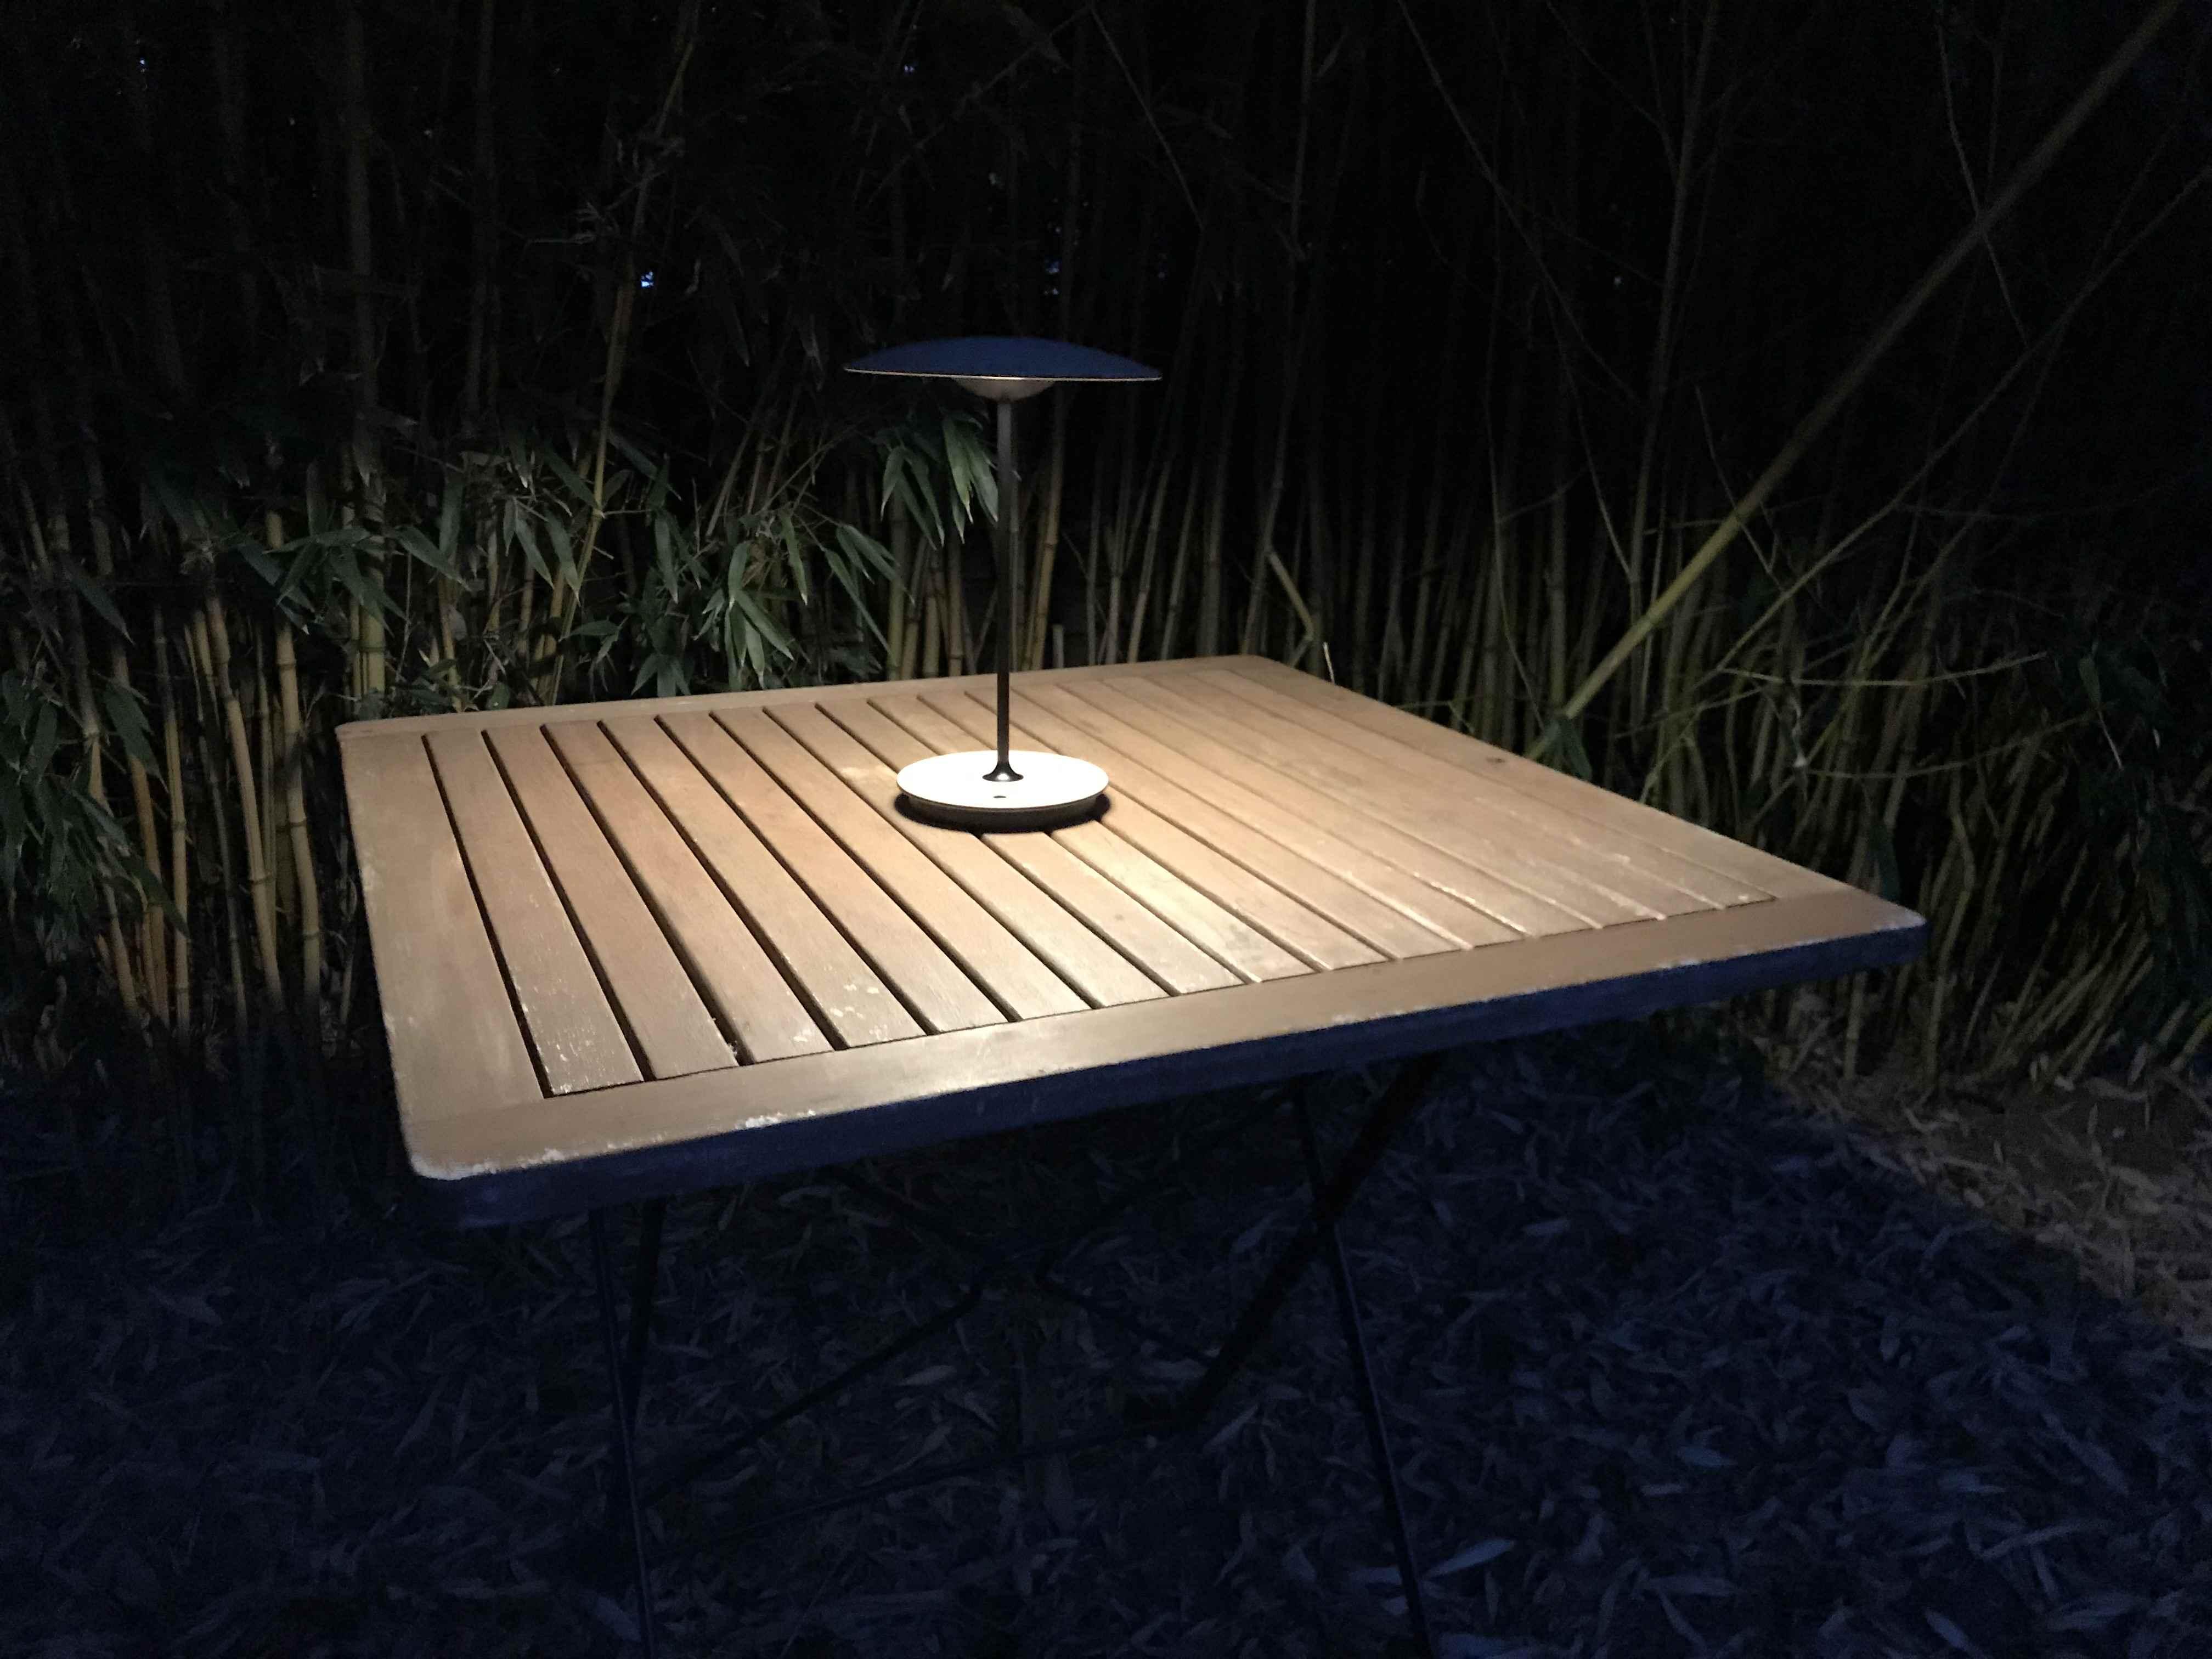 akku tischlampe free akku lampe kabellose leuchte owl. Black Bedroom Furniture Sets. Home Design Ideas